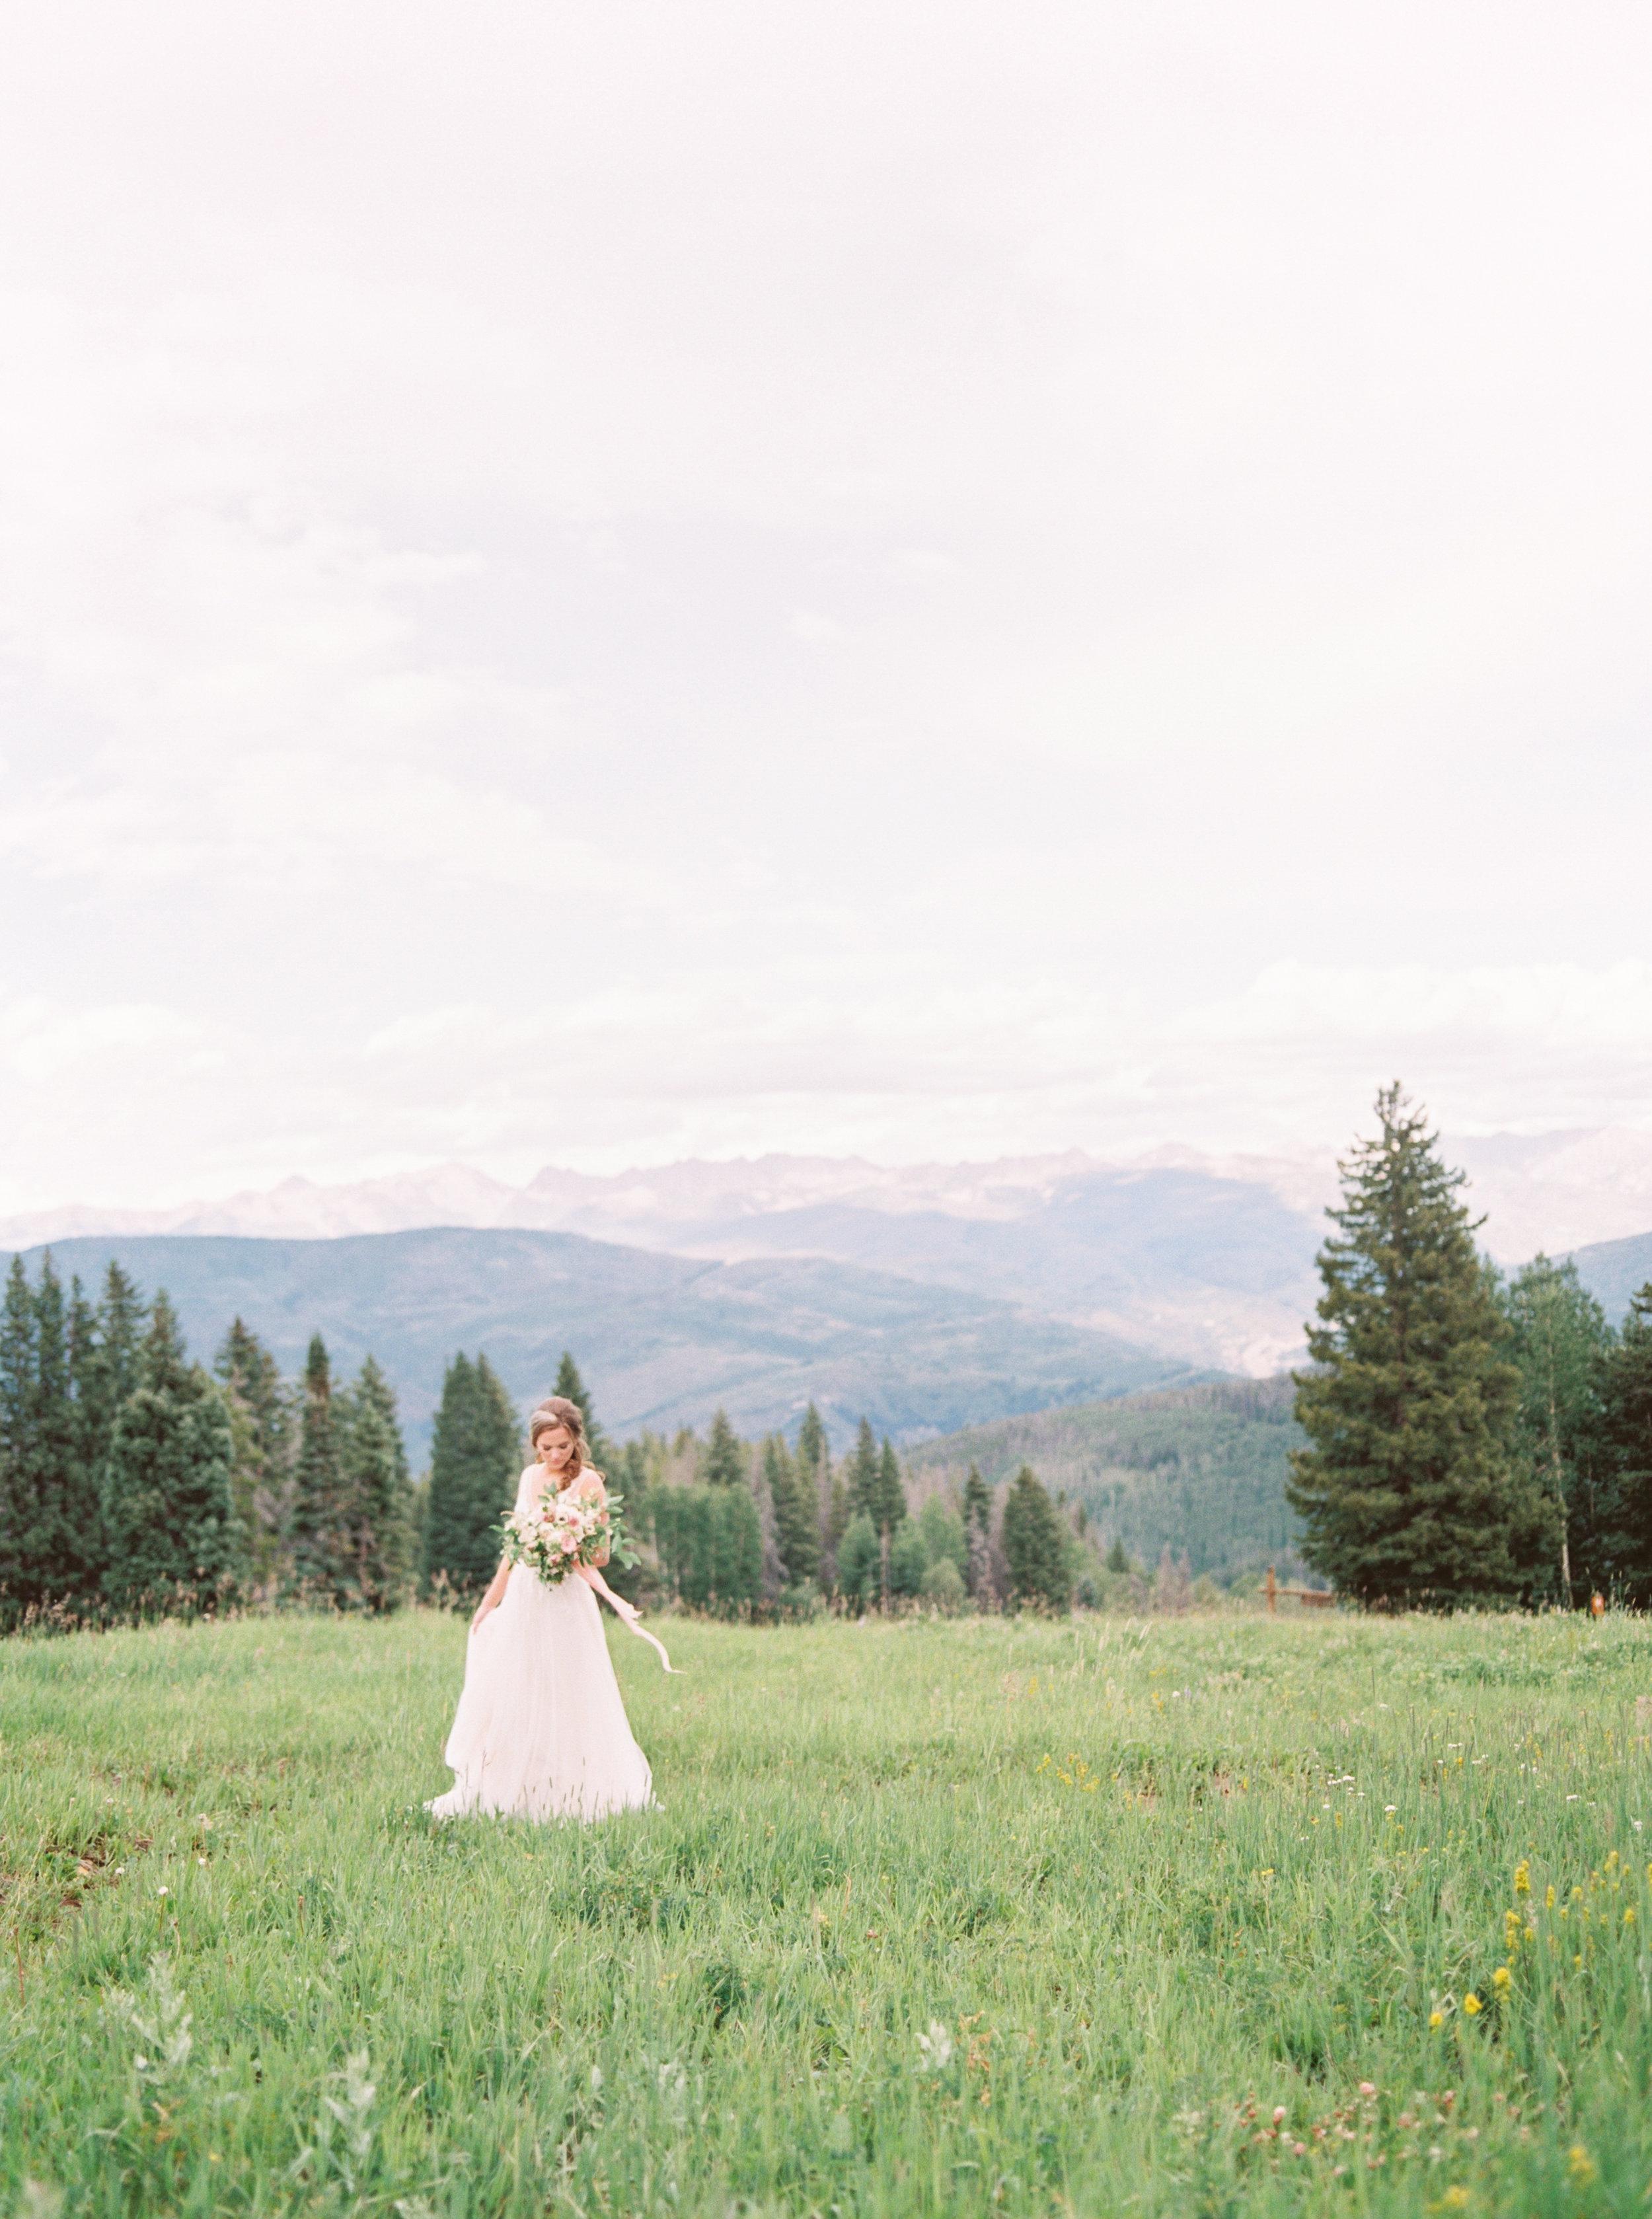 Callie Manion Photography_Beaver Creek Editorial_090 copy.JPG